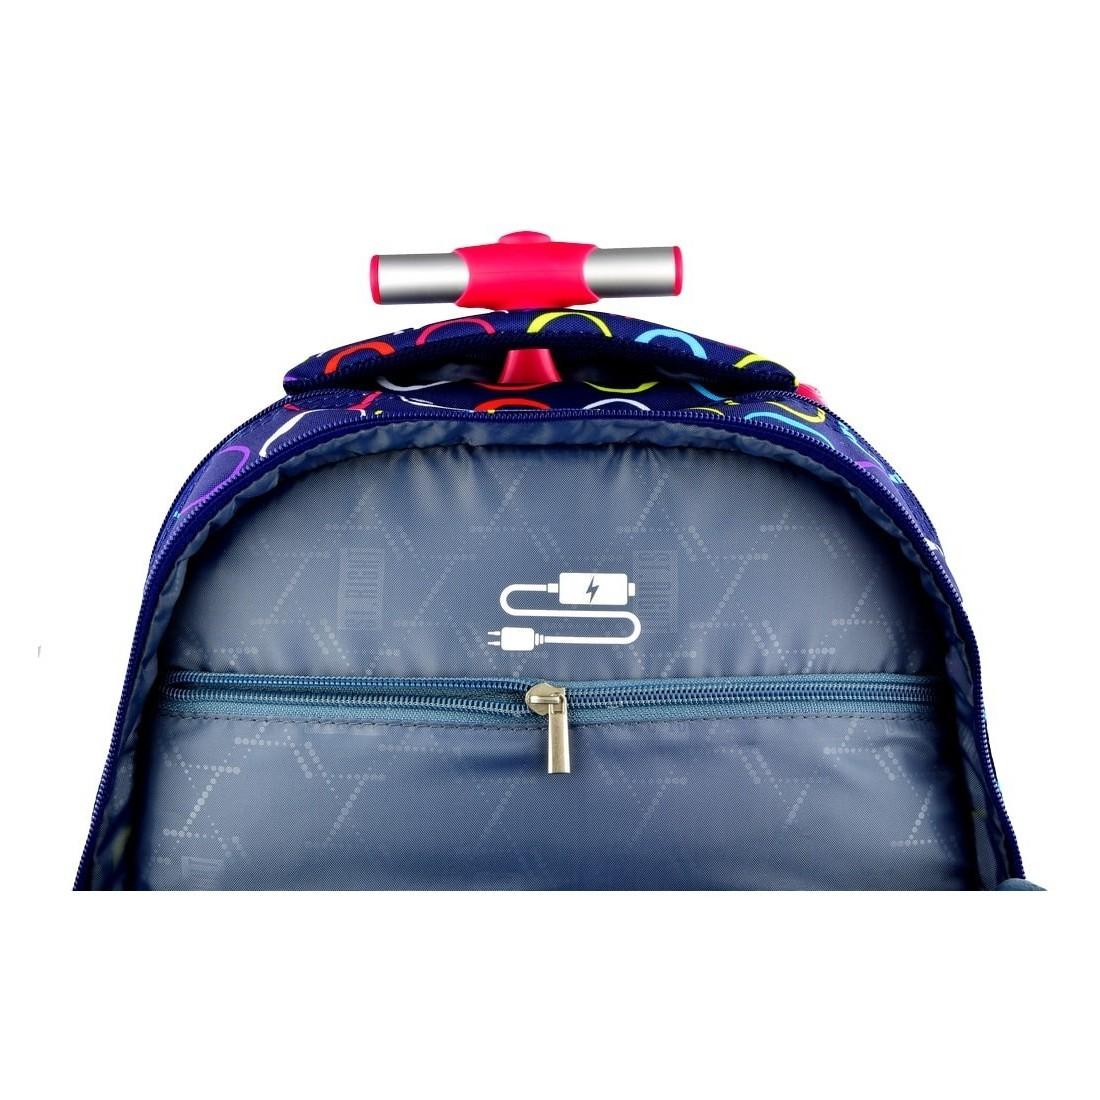 e699b55053e65 Plecak szkolny na kółkach St.Right Hoops dla dziewczynki - plecak -tornister.pl